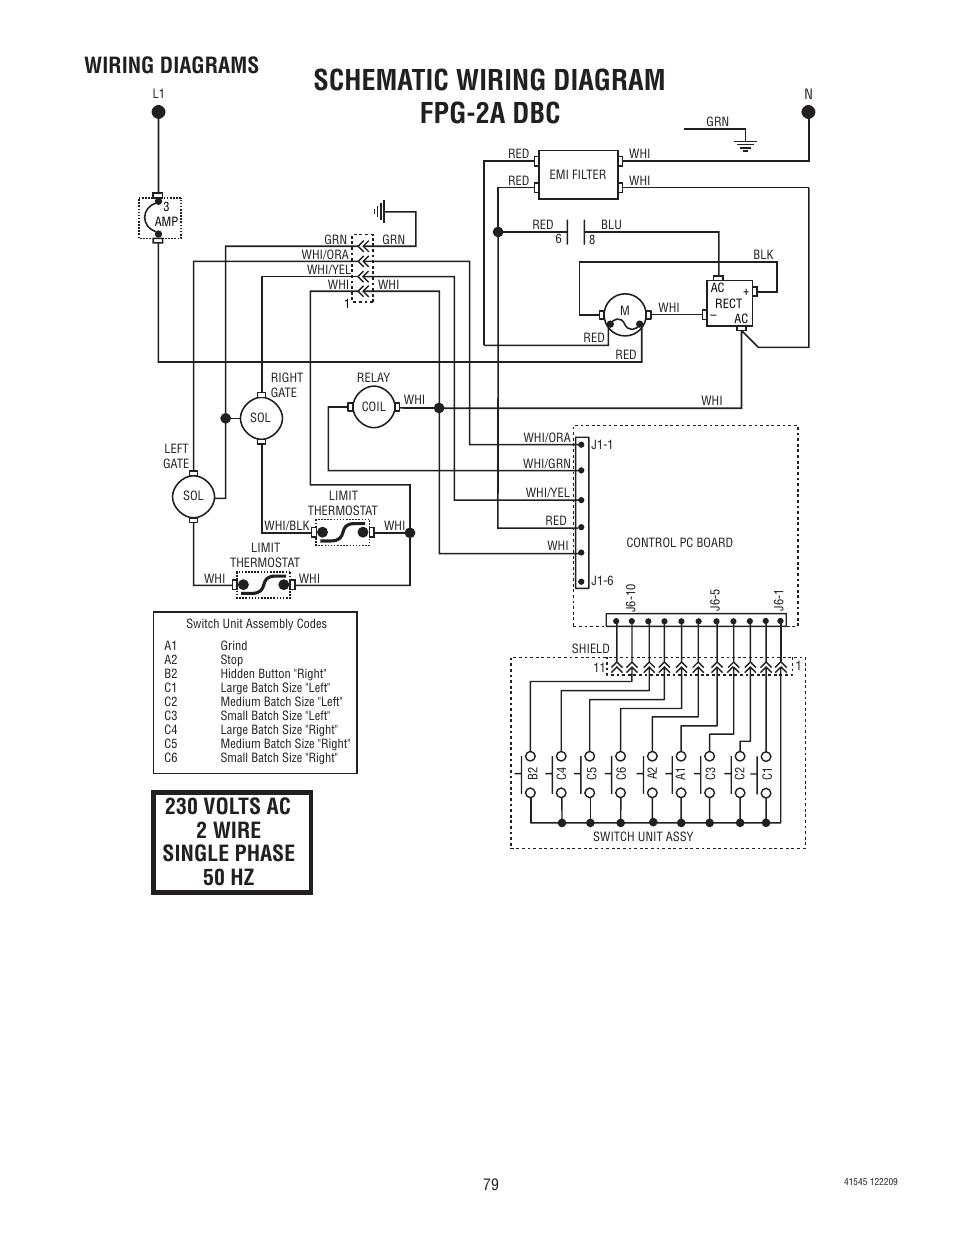 medium resolution of schematic wiring diagram fpg 2a dbc wiring diagrams bunn g9 2t dbc user manual page 79 79